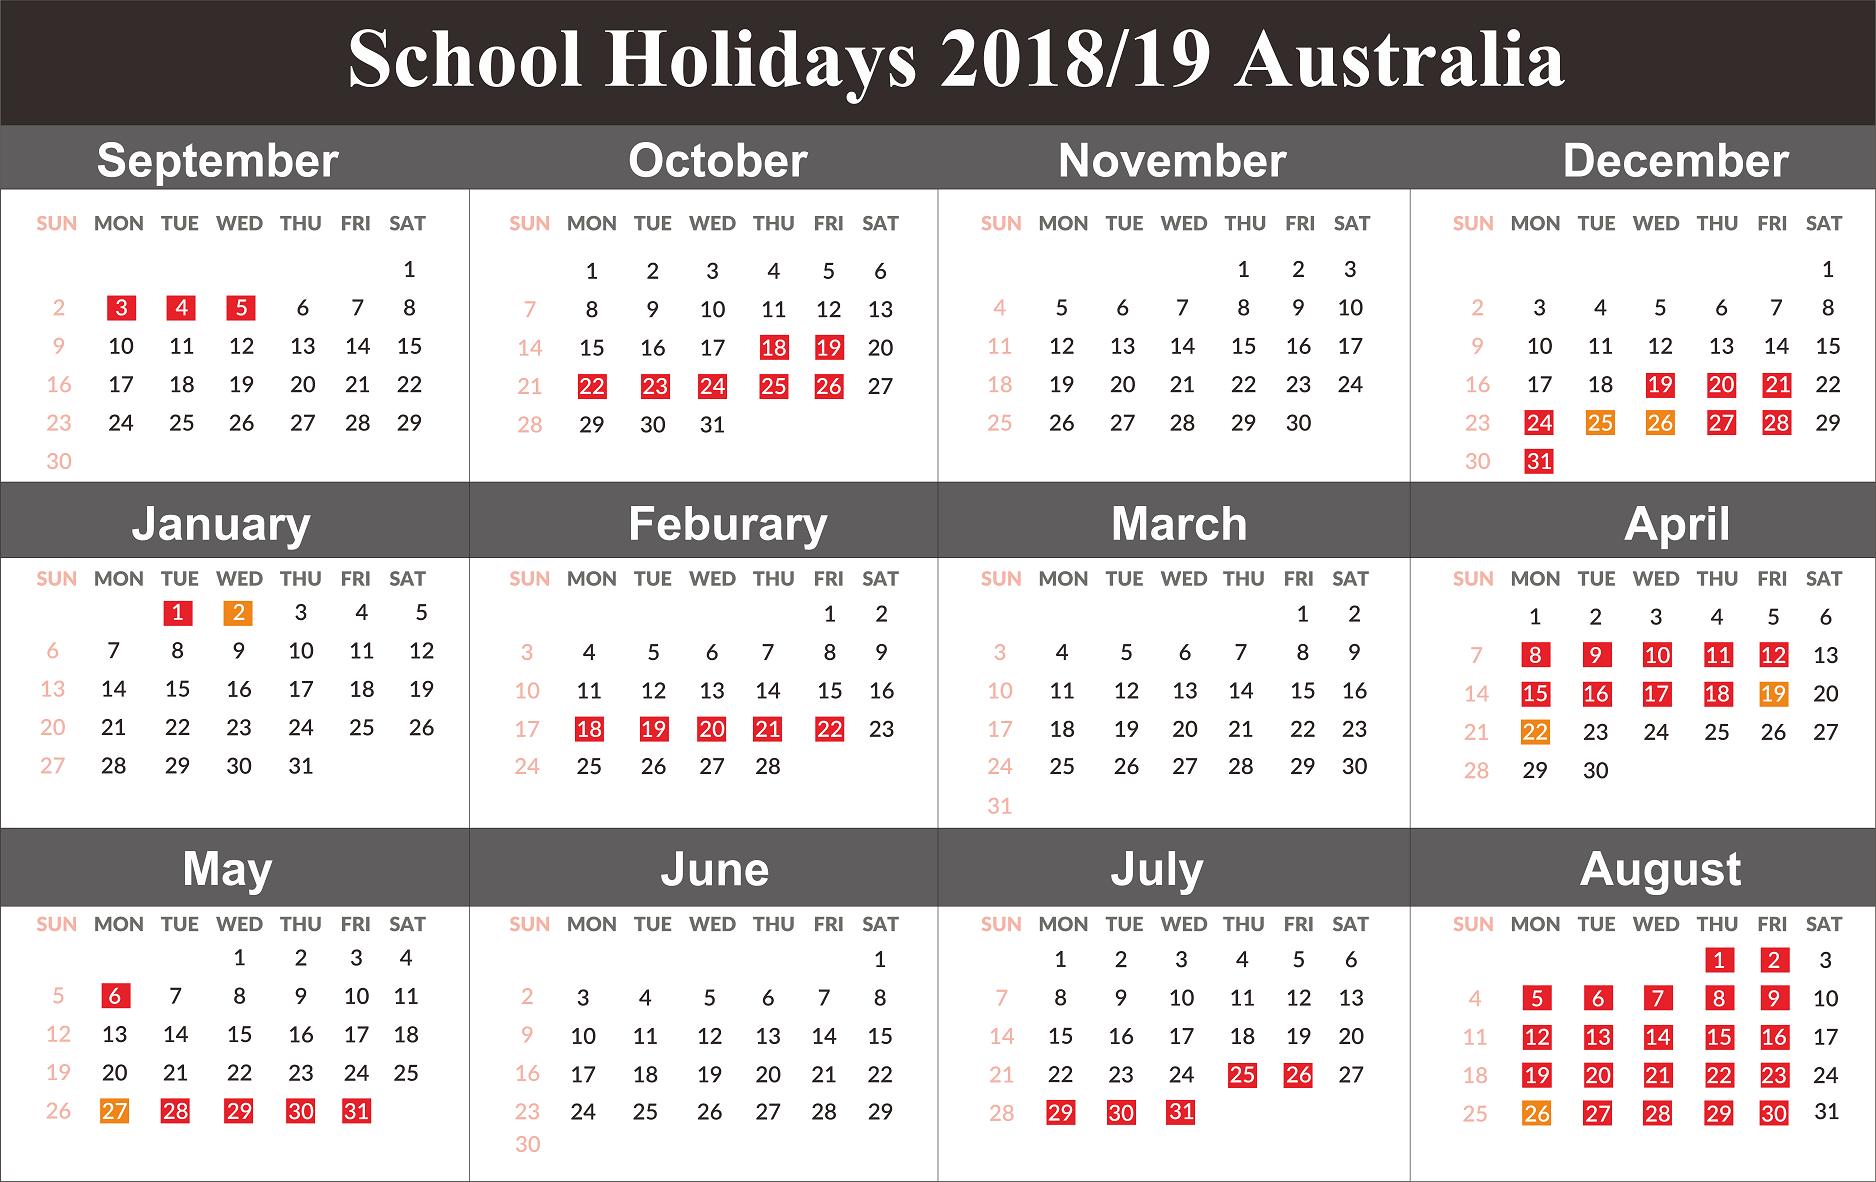 Australia 2019 School Holidays Calendar | 2019 Calendars | Holiday Calendar 2019 Victoria